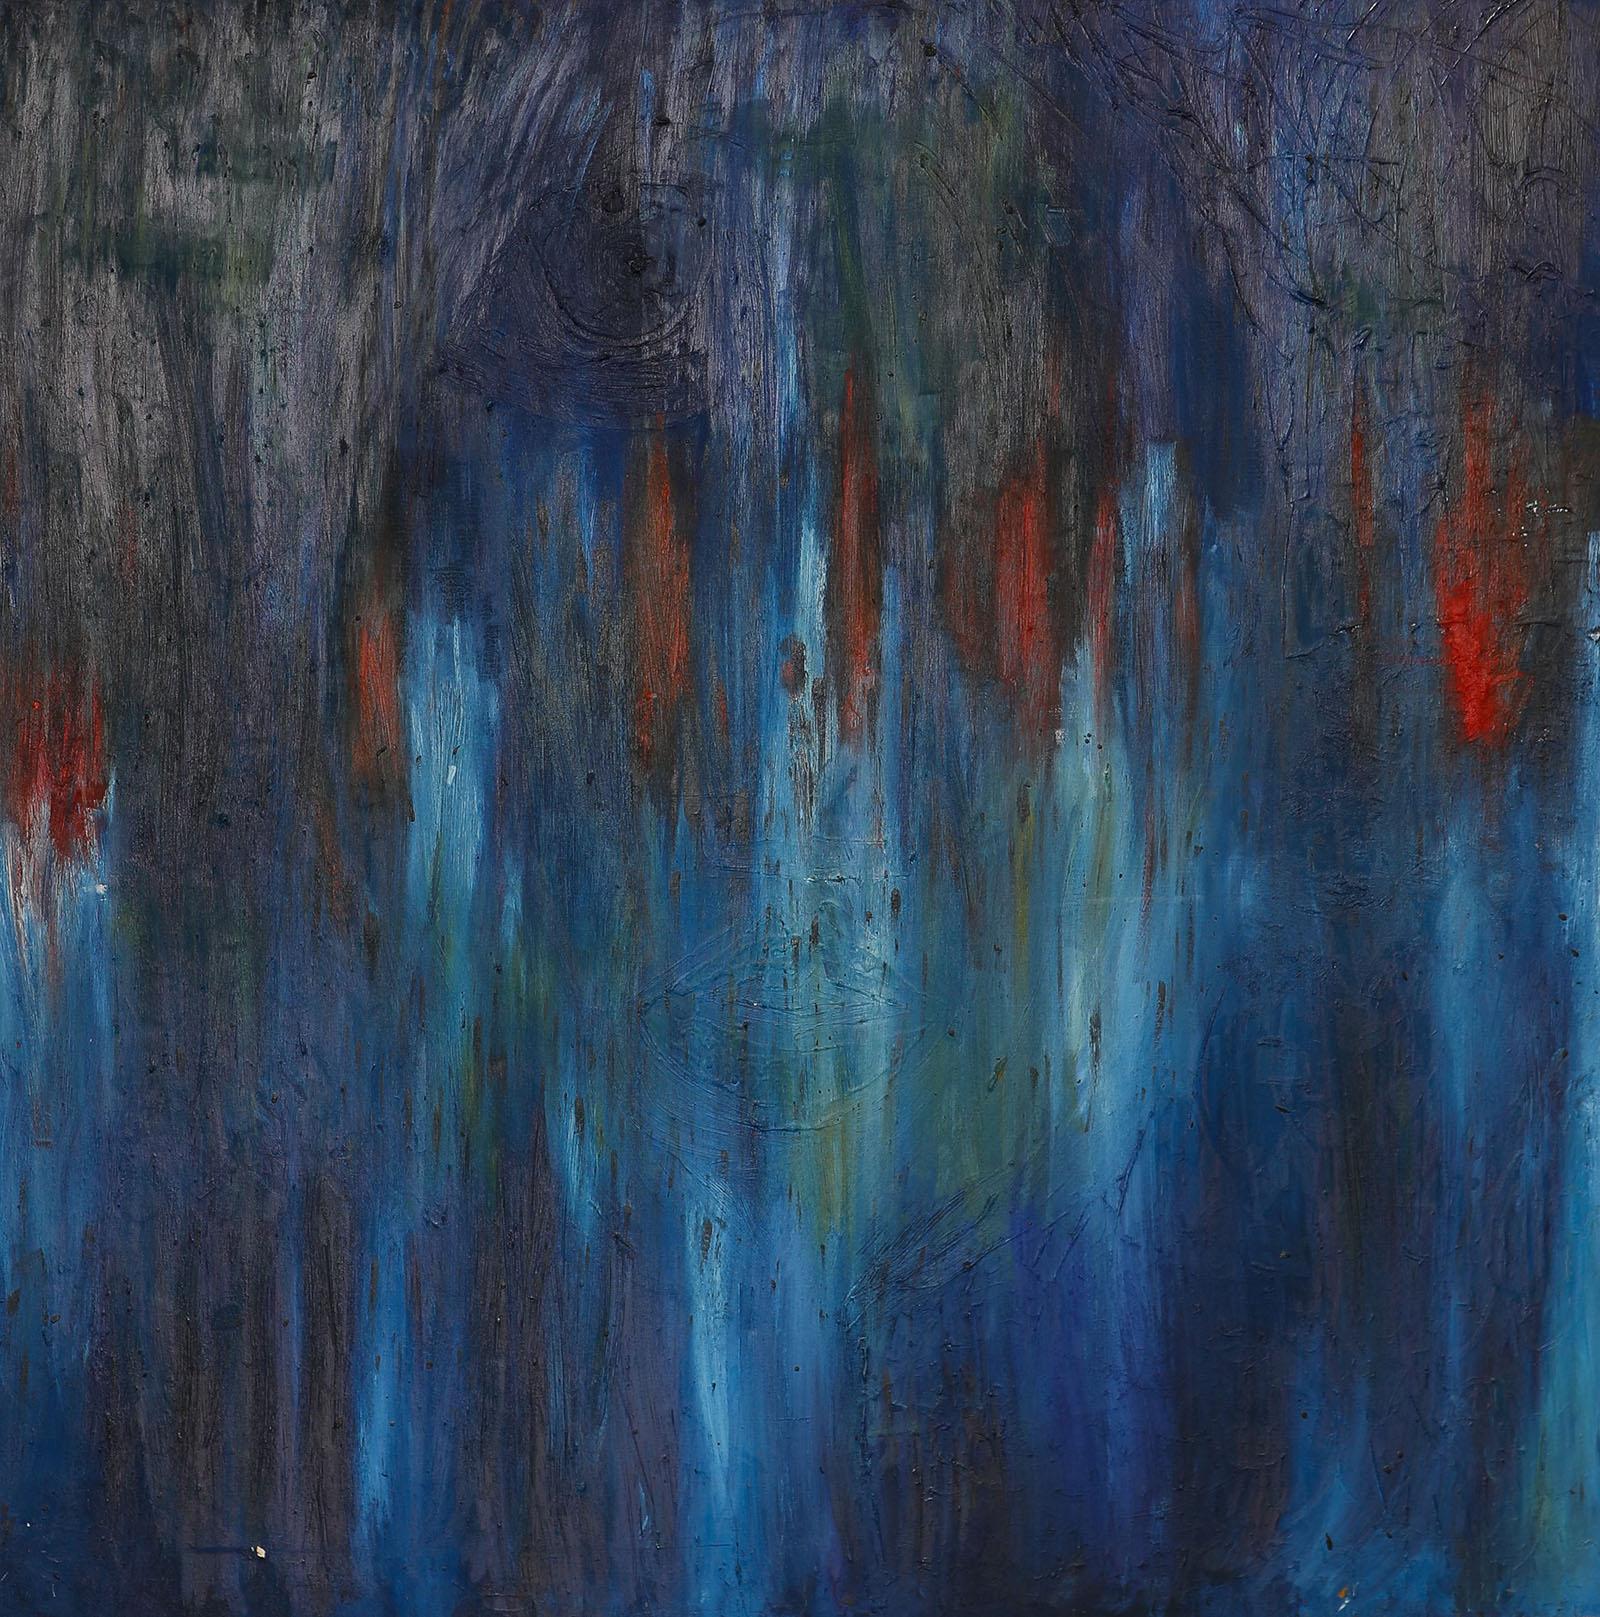 Noyade - الغرق